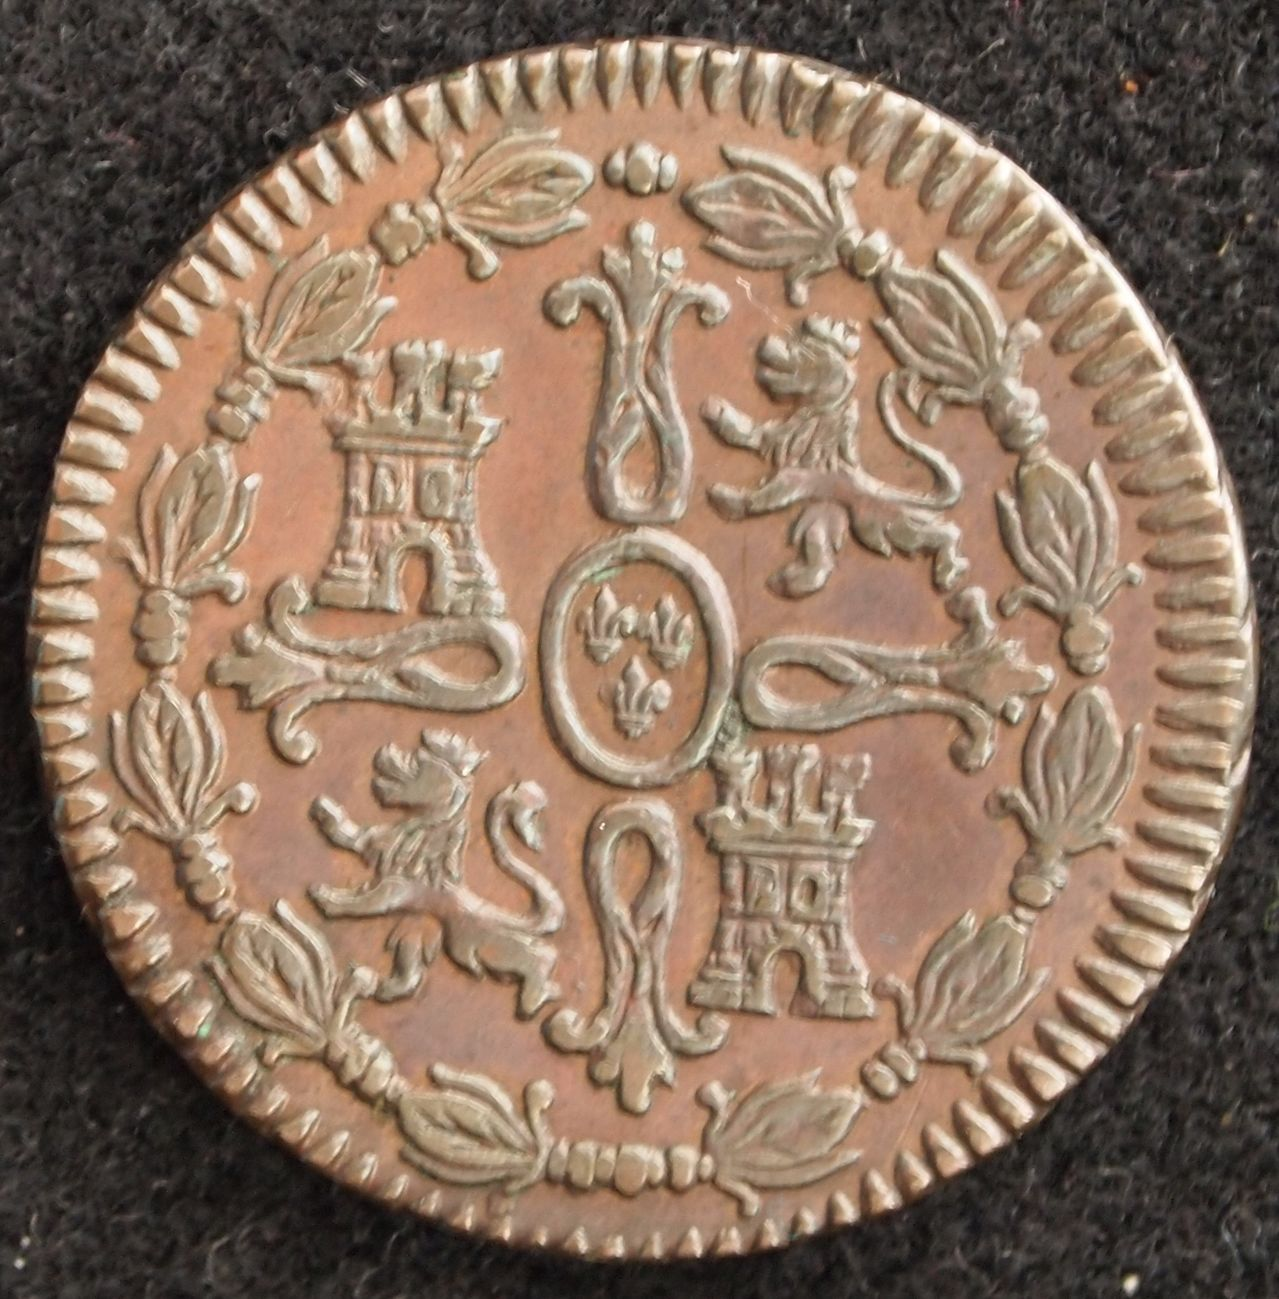 8 maravedis fernando VII 1816 2